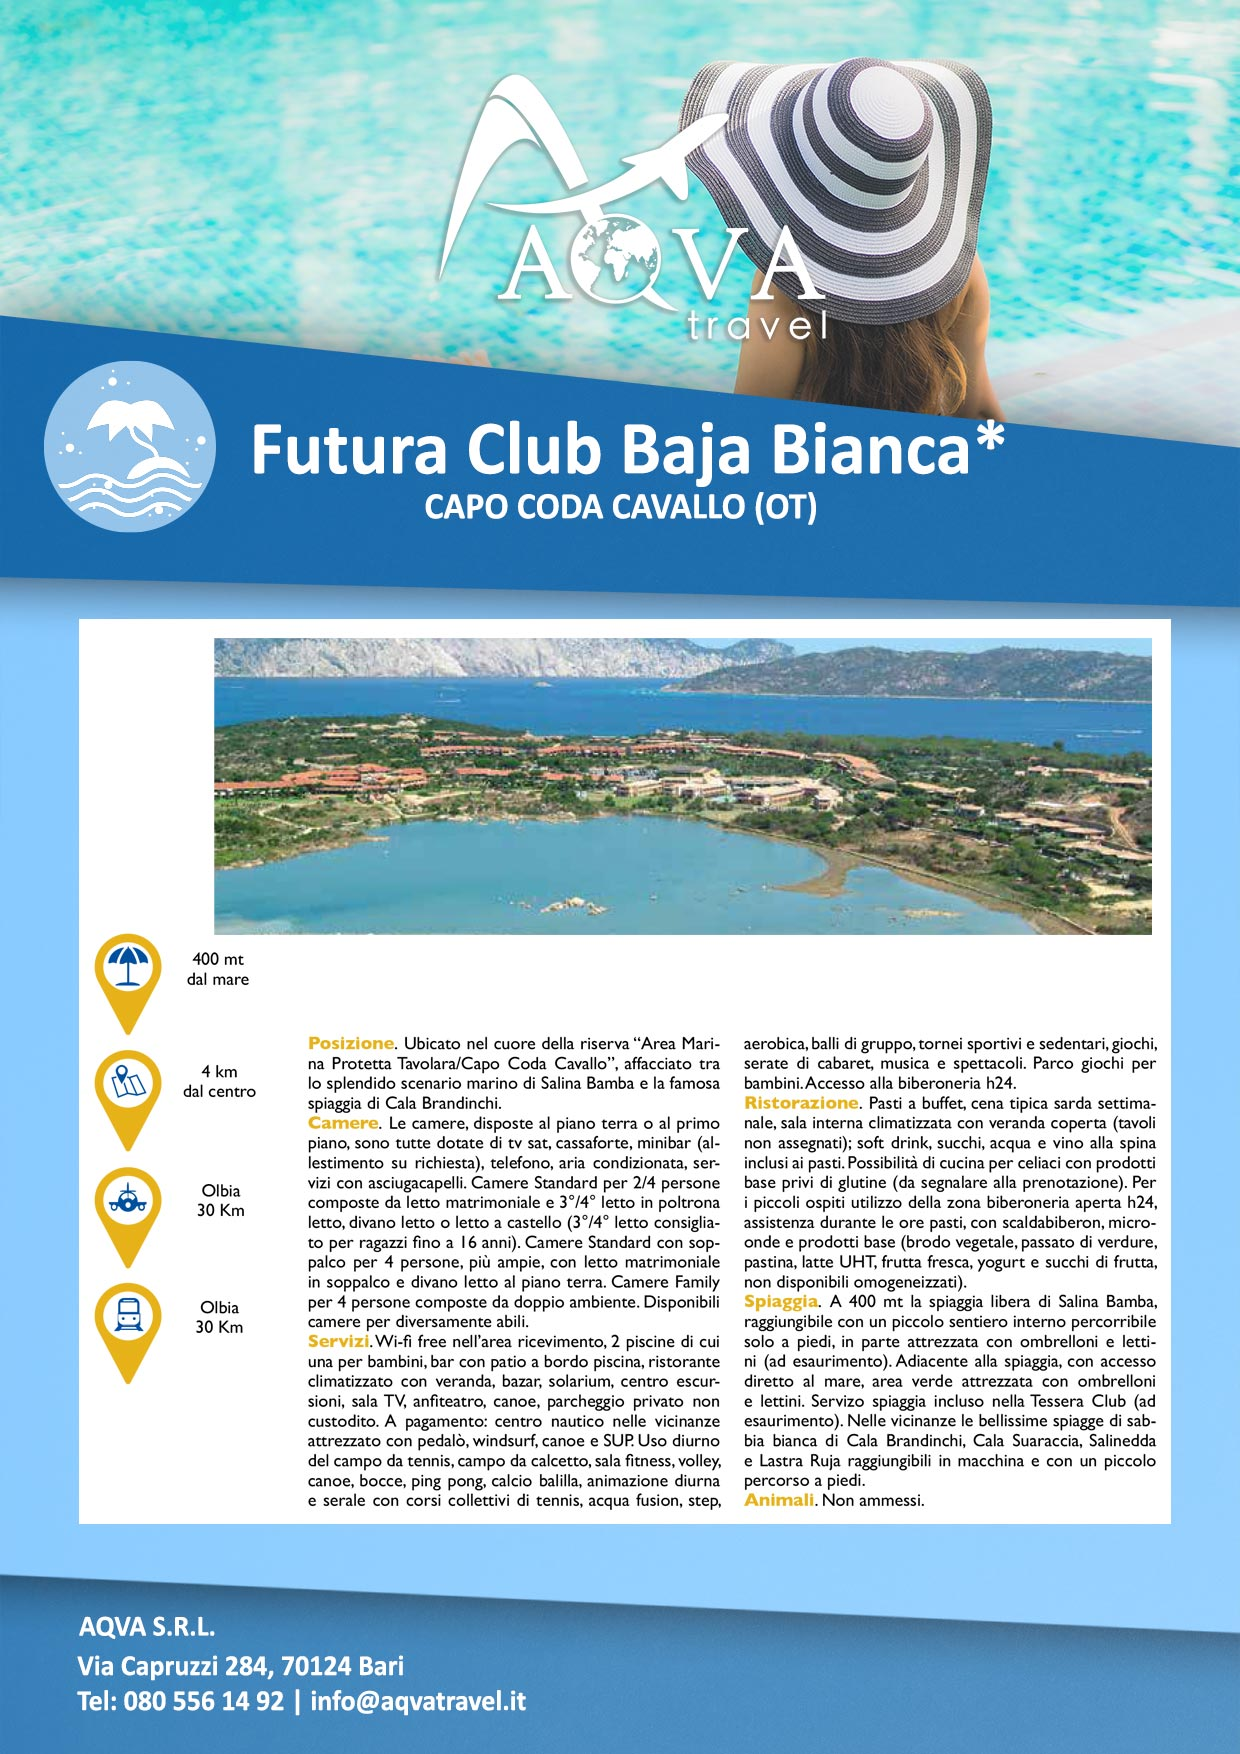 Futura-Club-Baja-Bianca-Mare-offerte-agenzia-di-viaggi-Bari-AQVATRAVEL-it